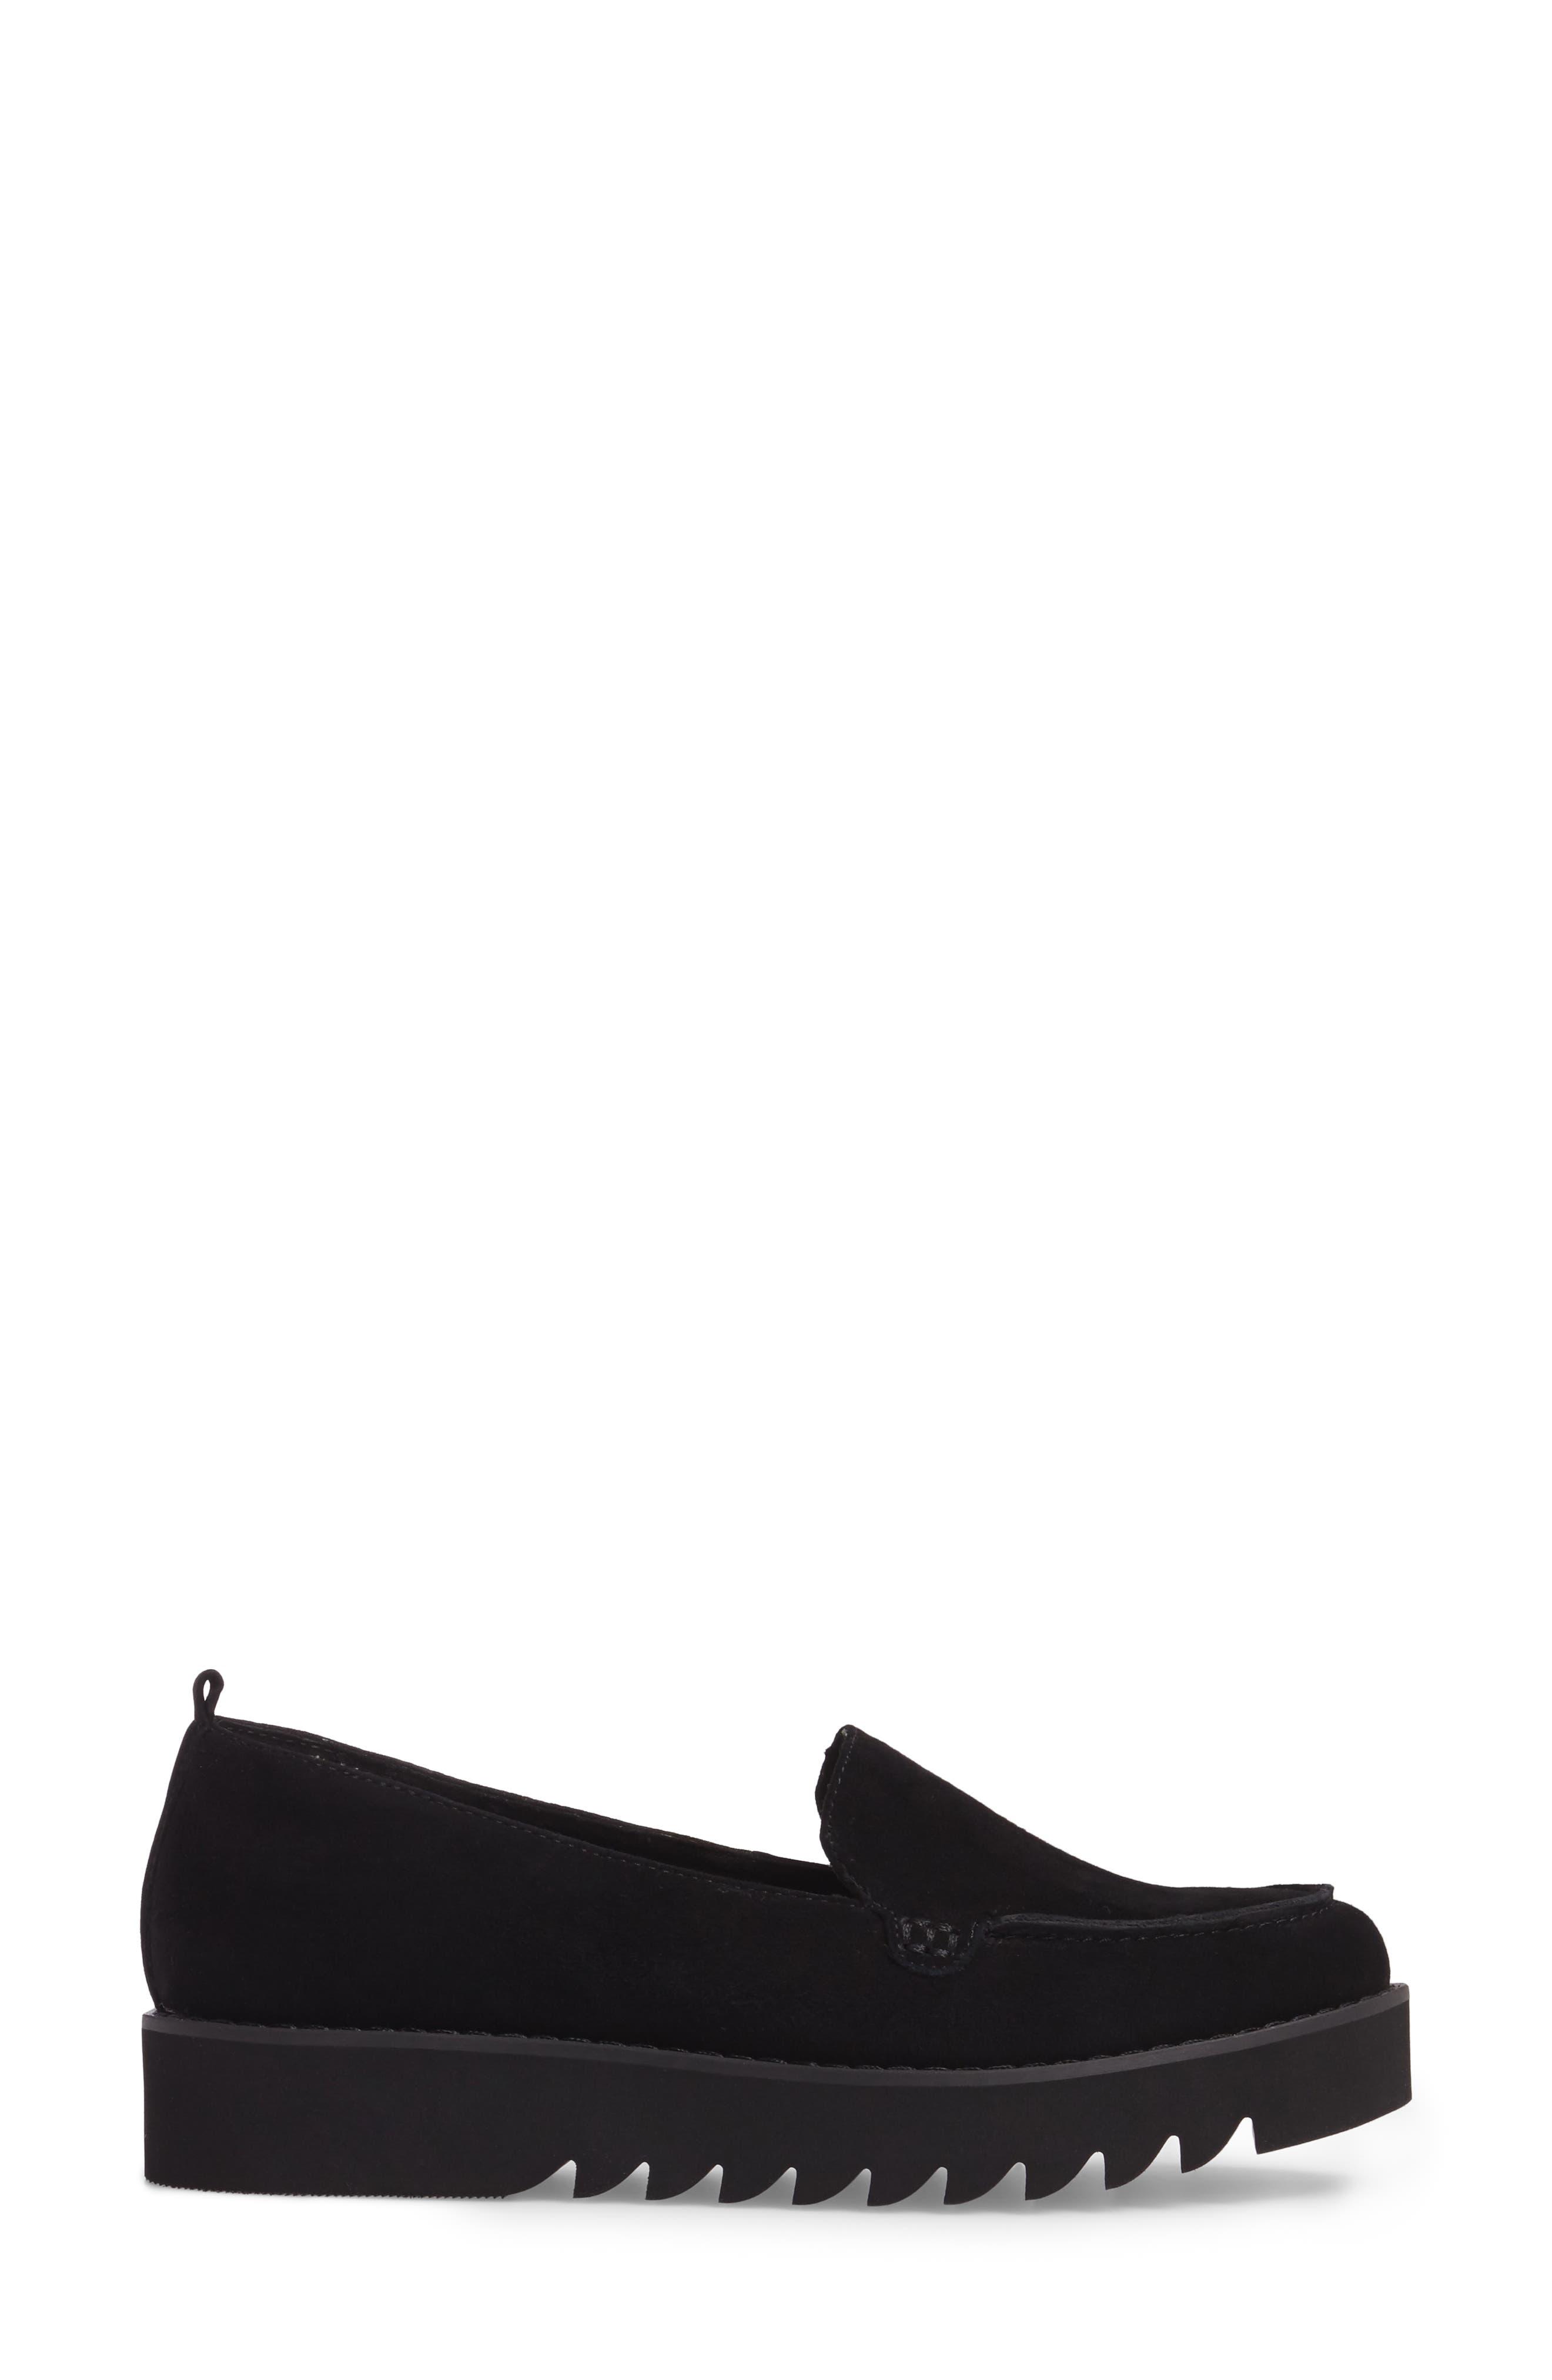 Kendall Loafer,                             Alternate thumbnail 3, color,                             Black Suede